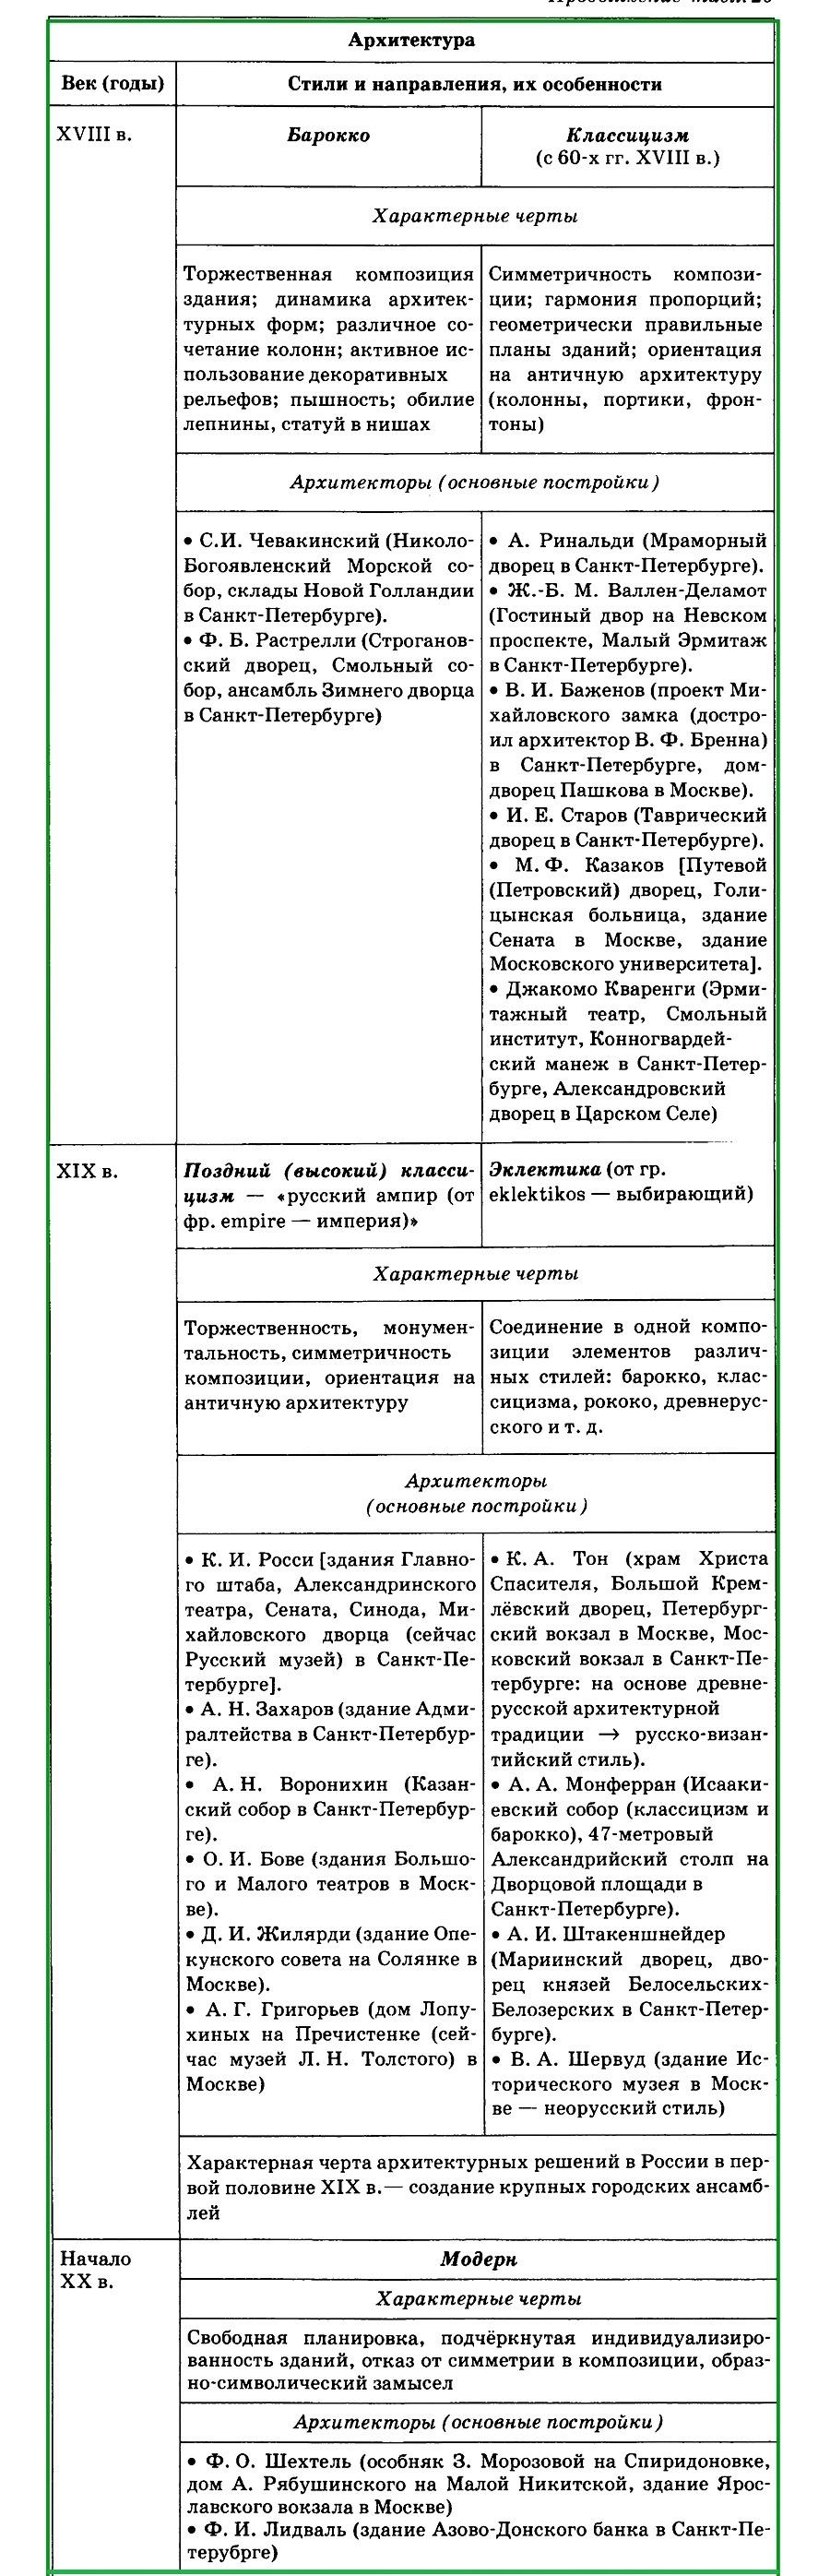 архитектура в XVIII - начале ХХ вв.